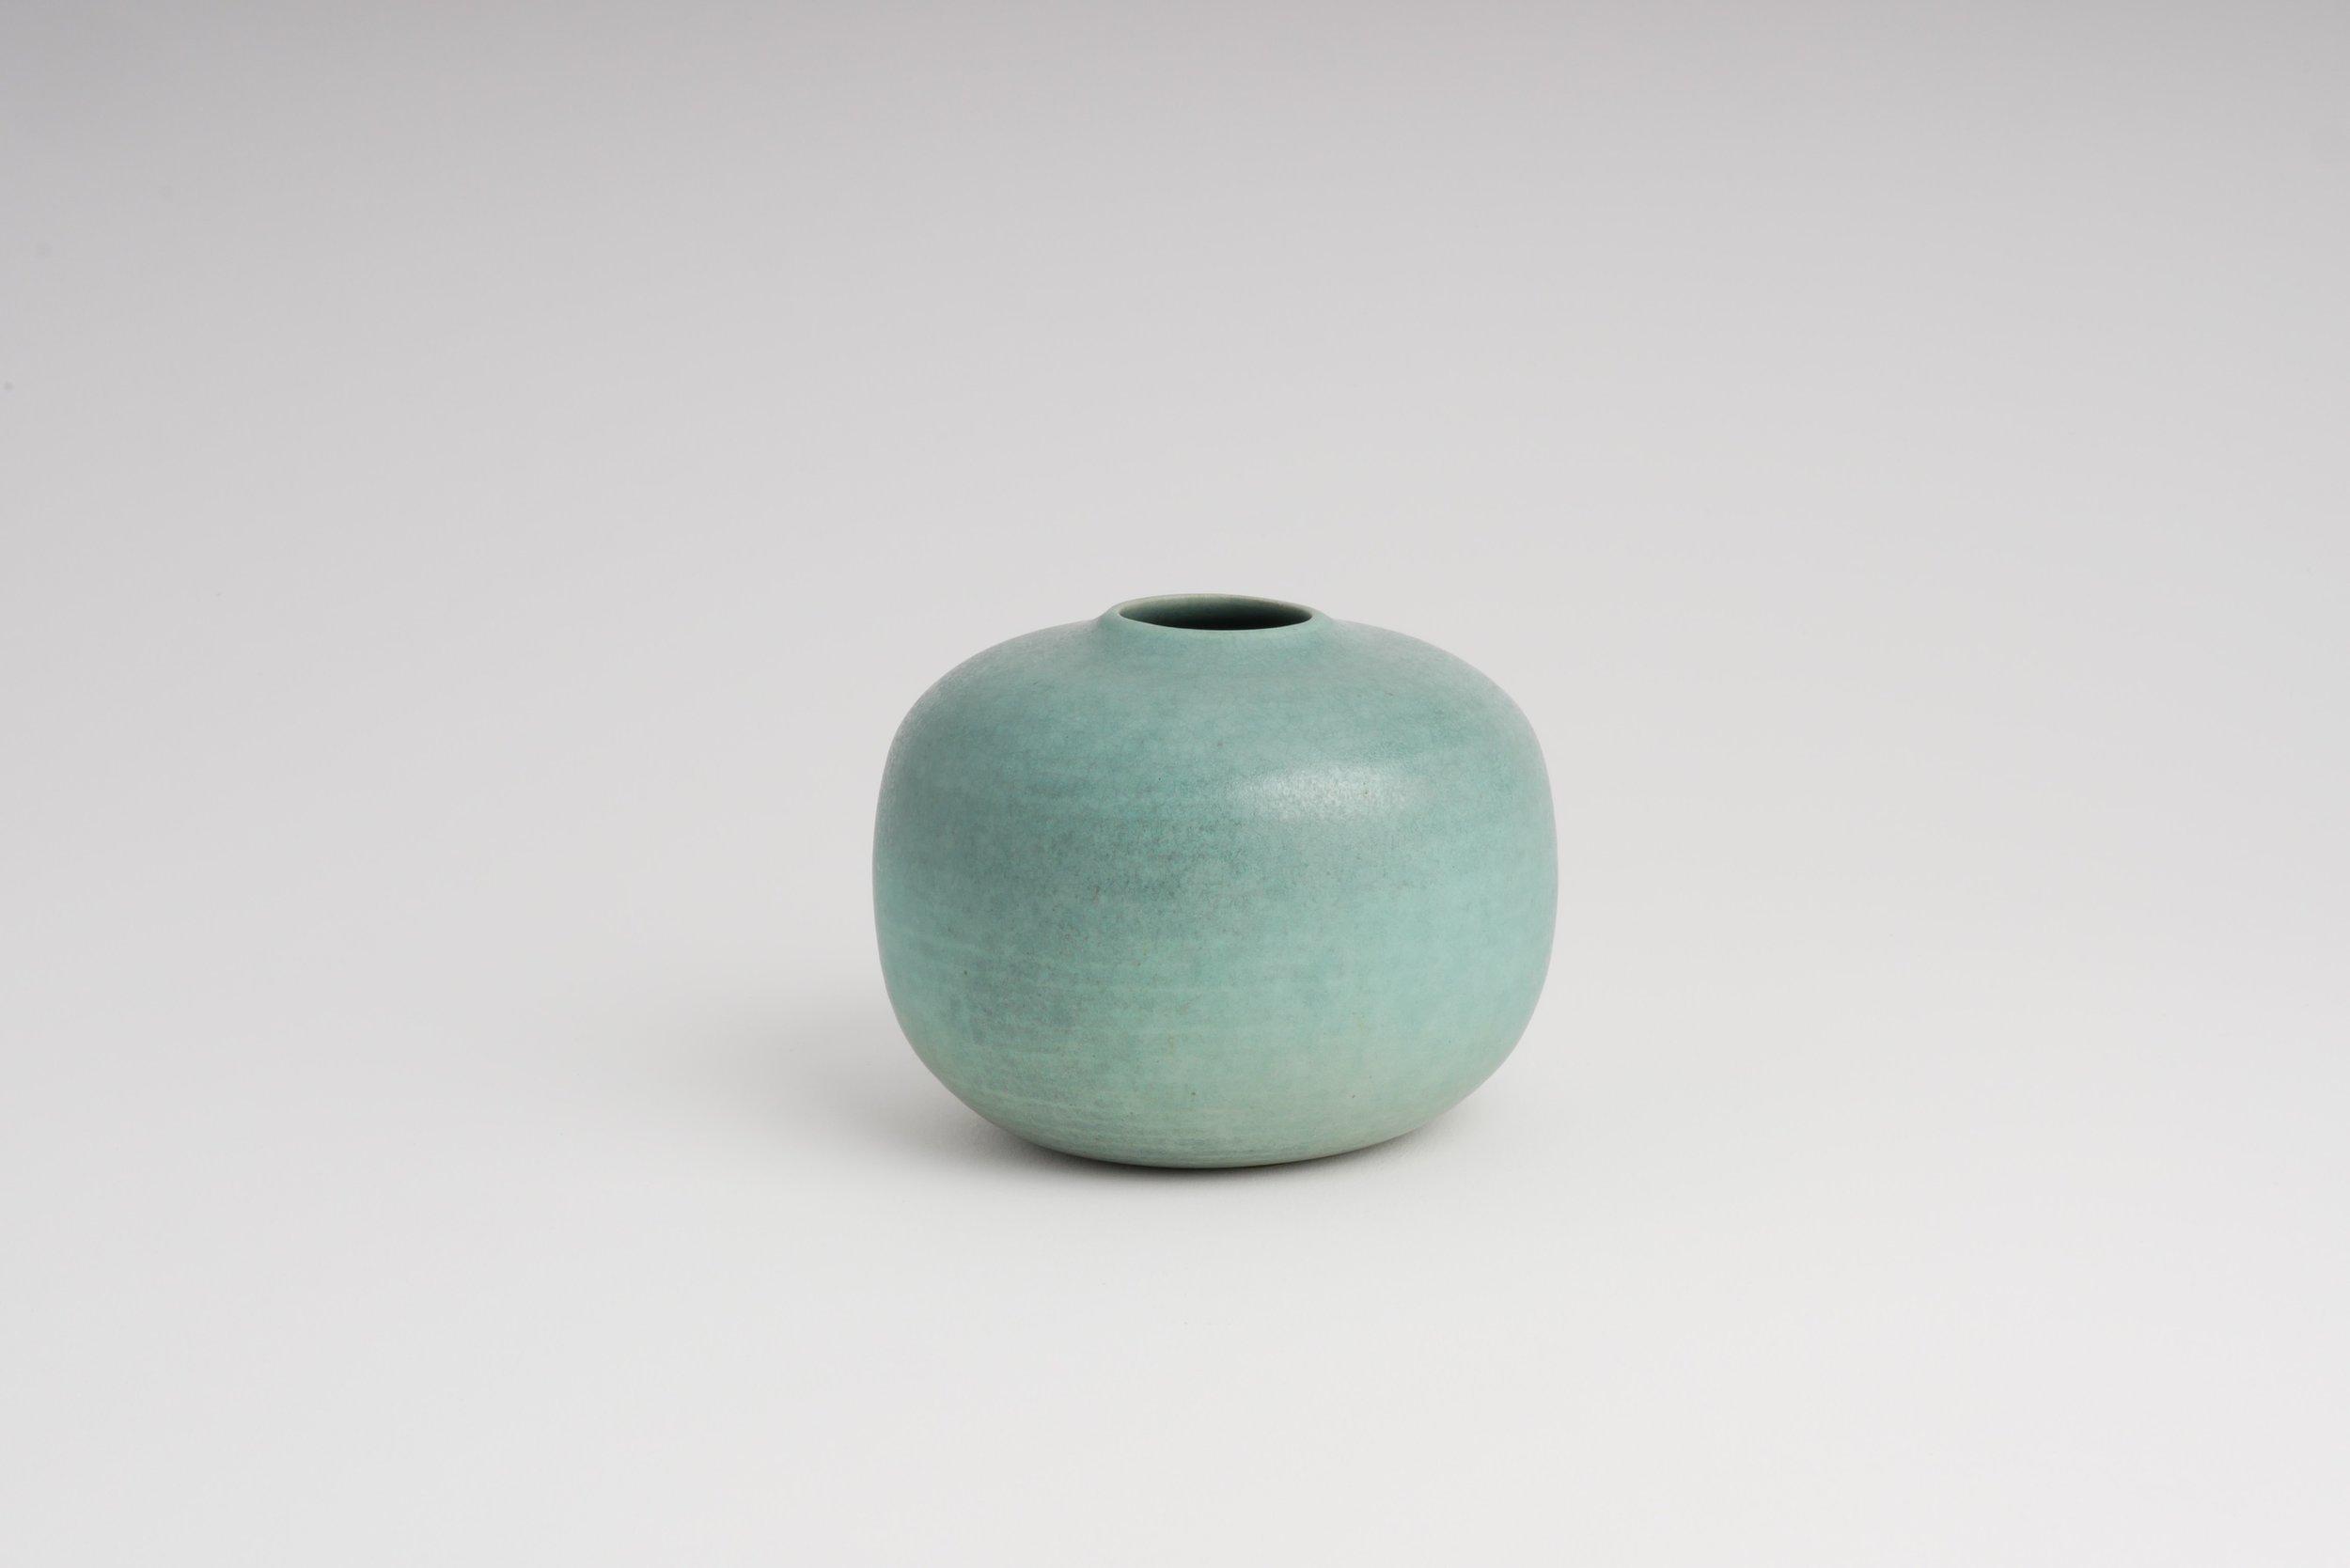 hap_ceramics_Keramik_Düsseldorf_Maxi Hoffmann_Vase_Grün_Green.jpg